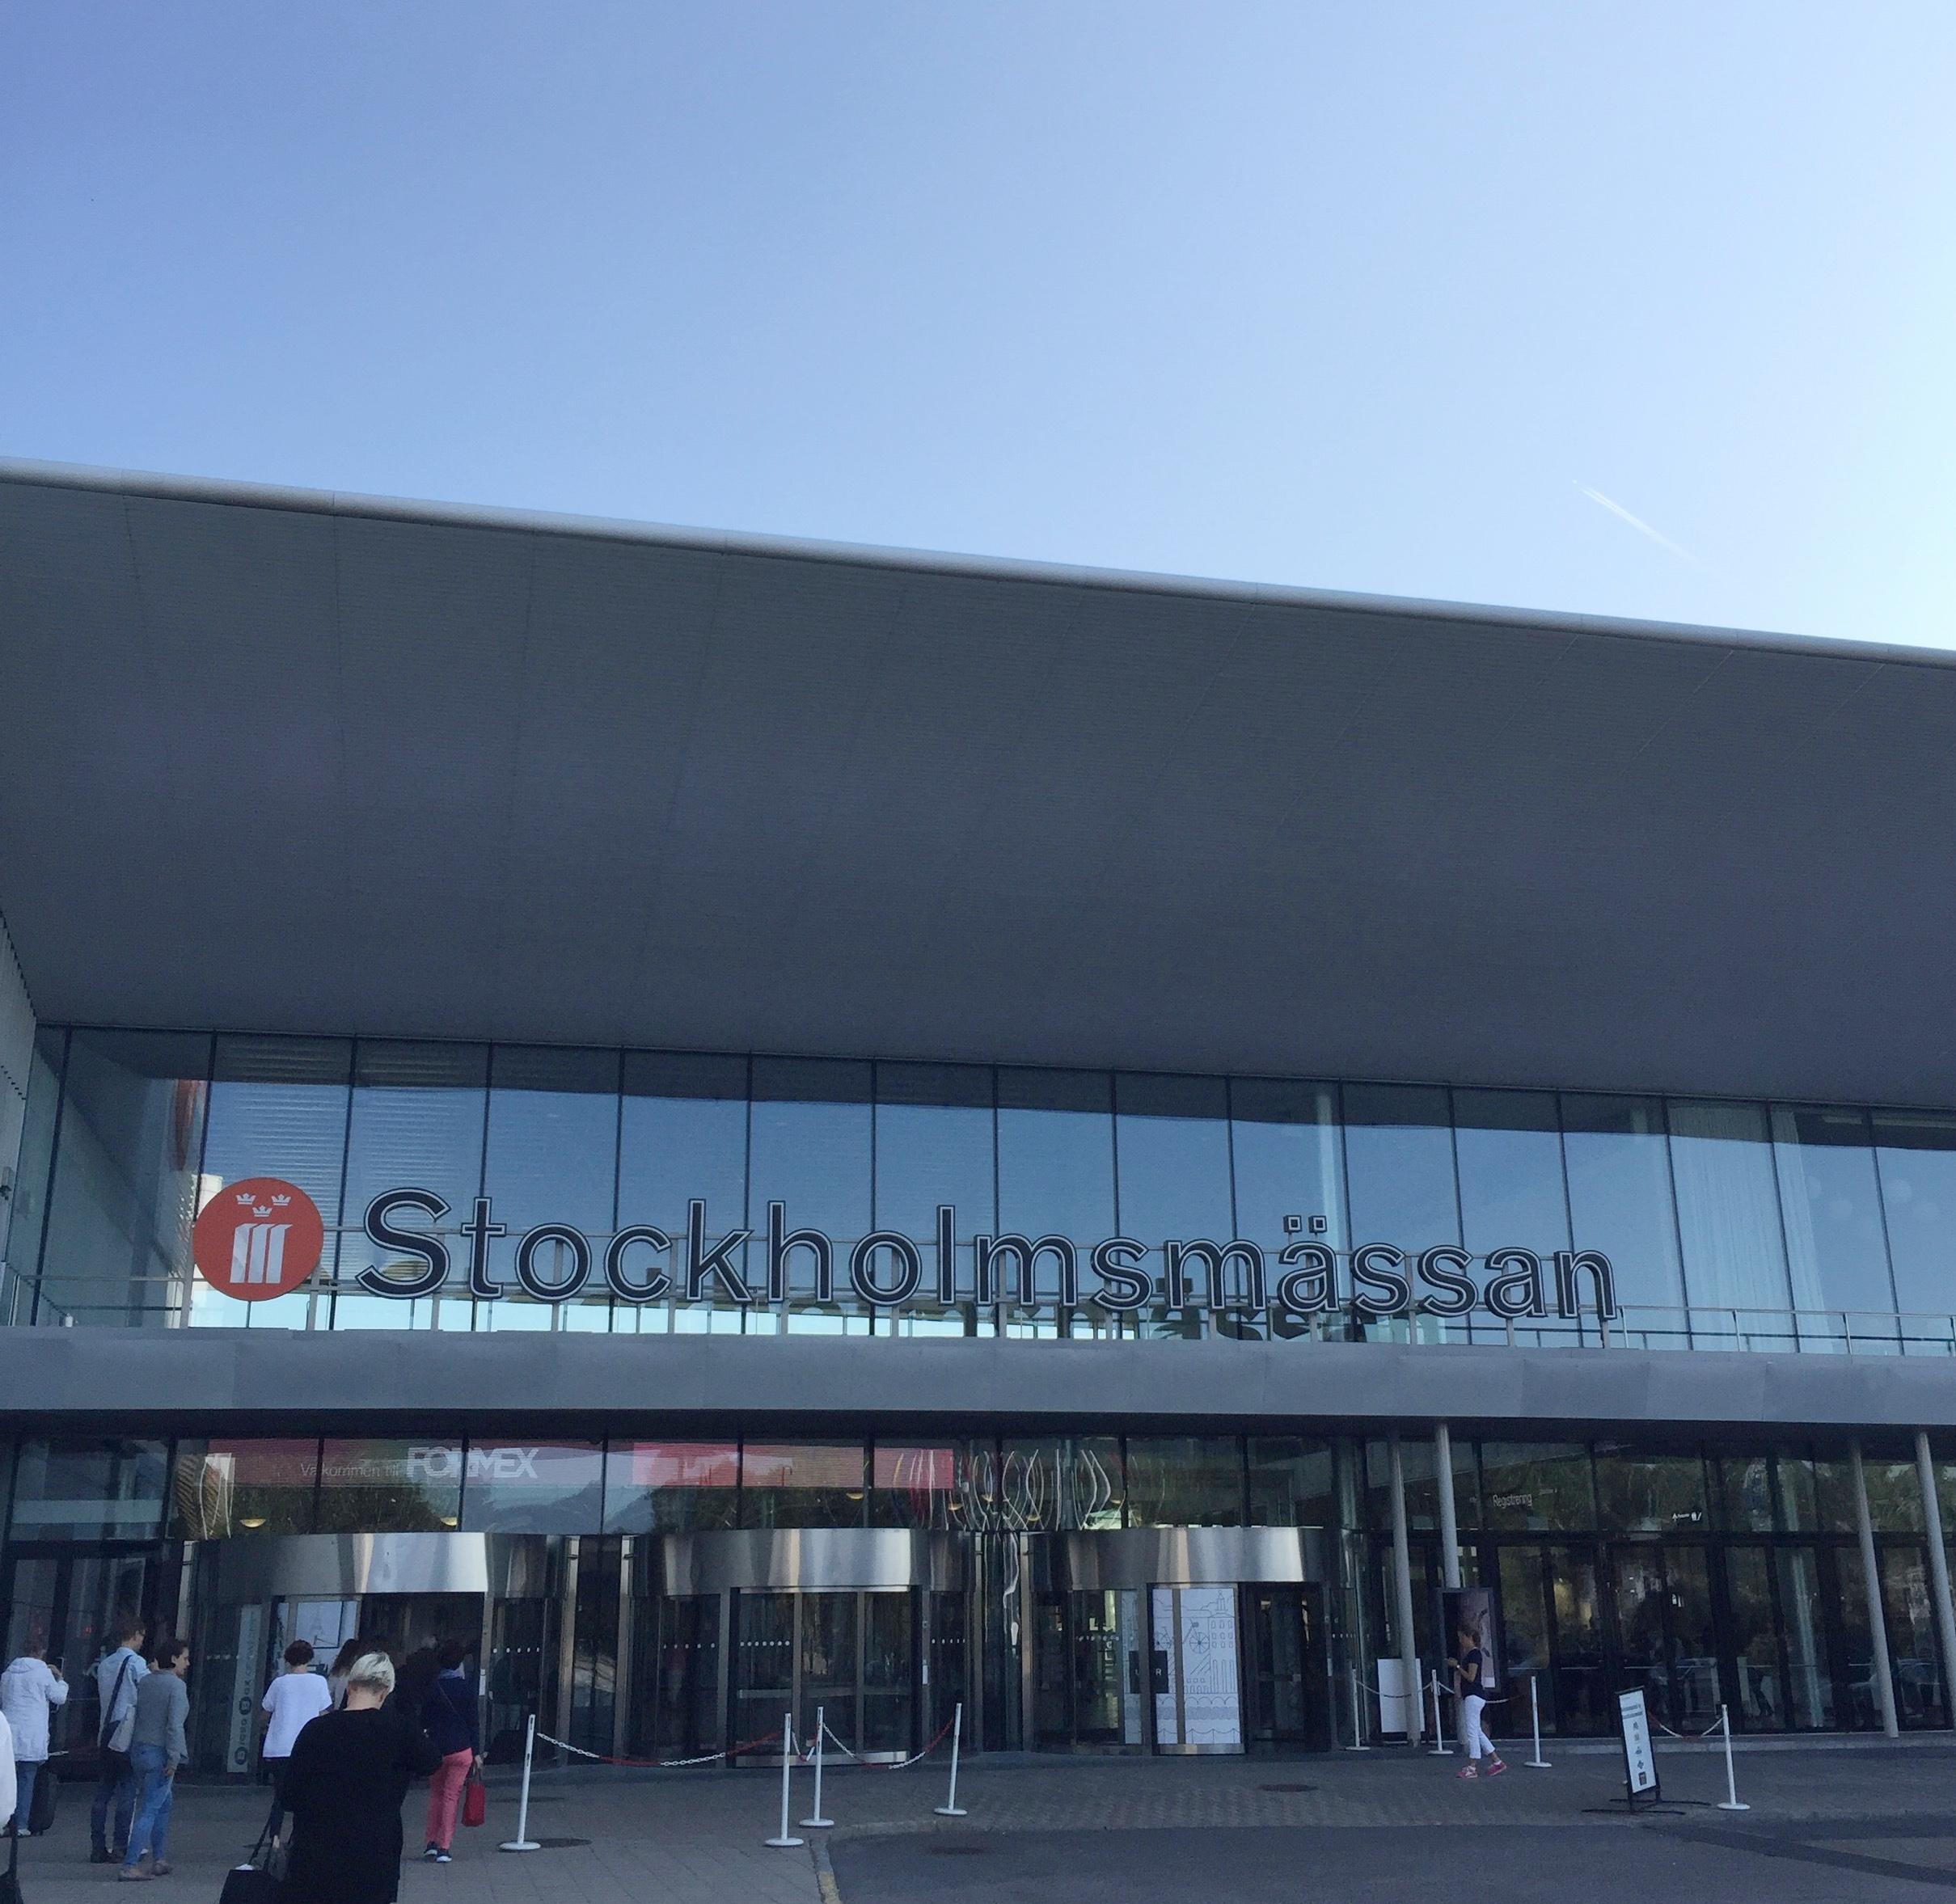 FORMEX resides at the large exhibition hall Stockholmsmässan in Älvsjö south of Stockholm.